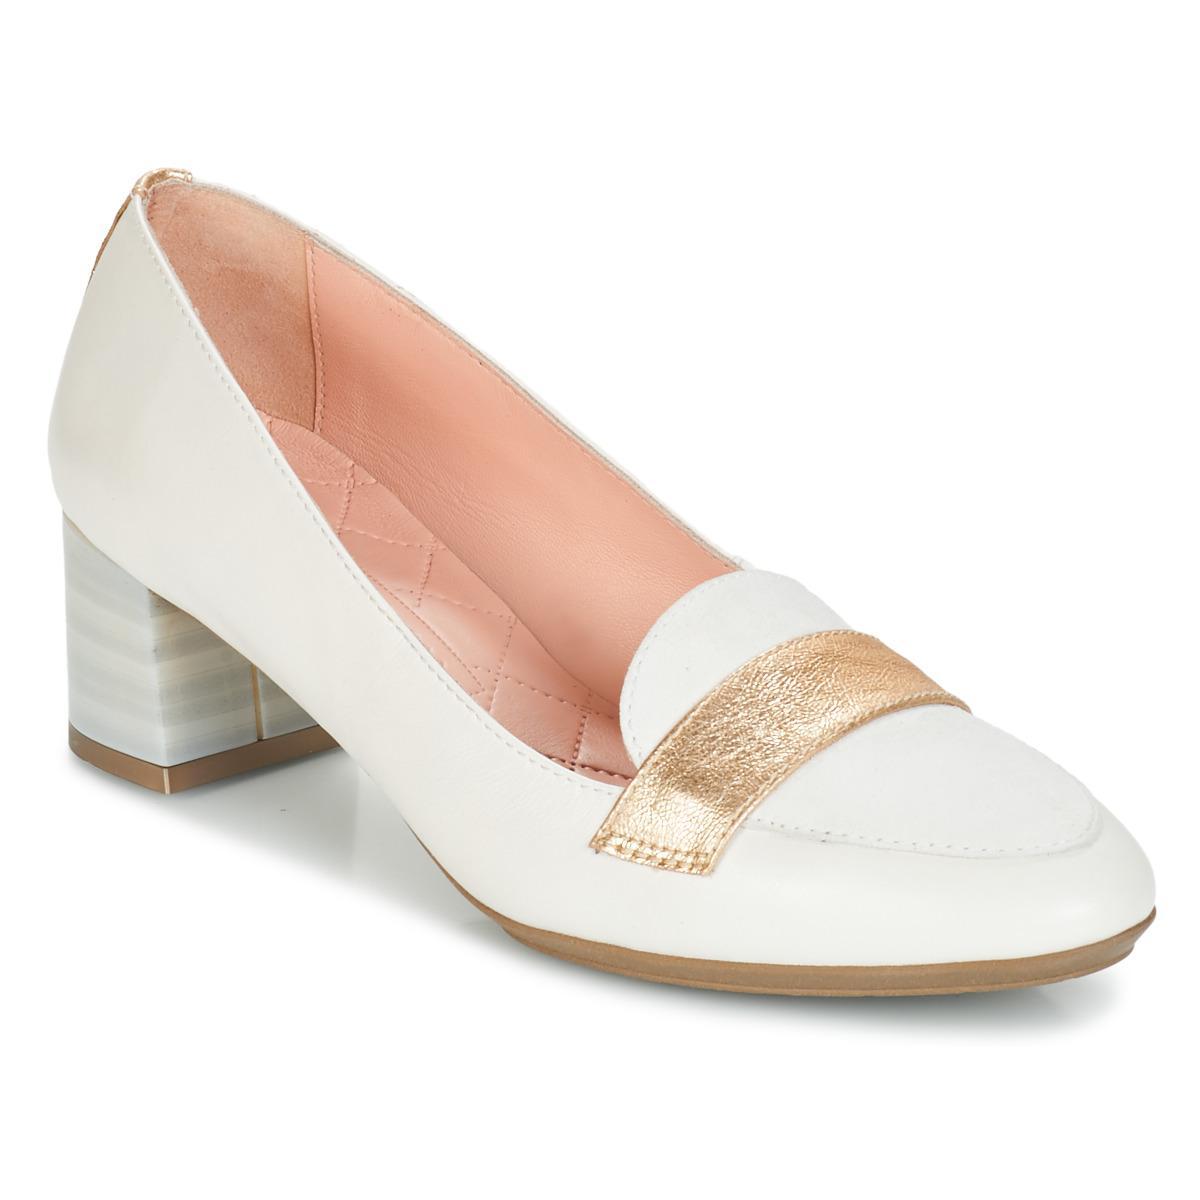 Rosa Metallic Lyst 5p Shoes In Court Hispanitas aRz17